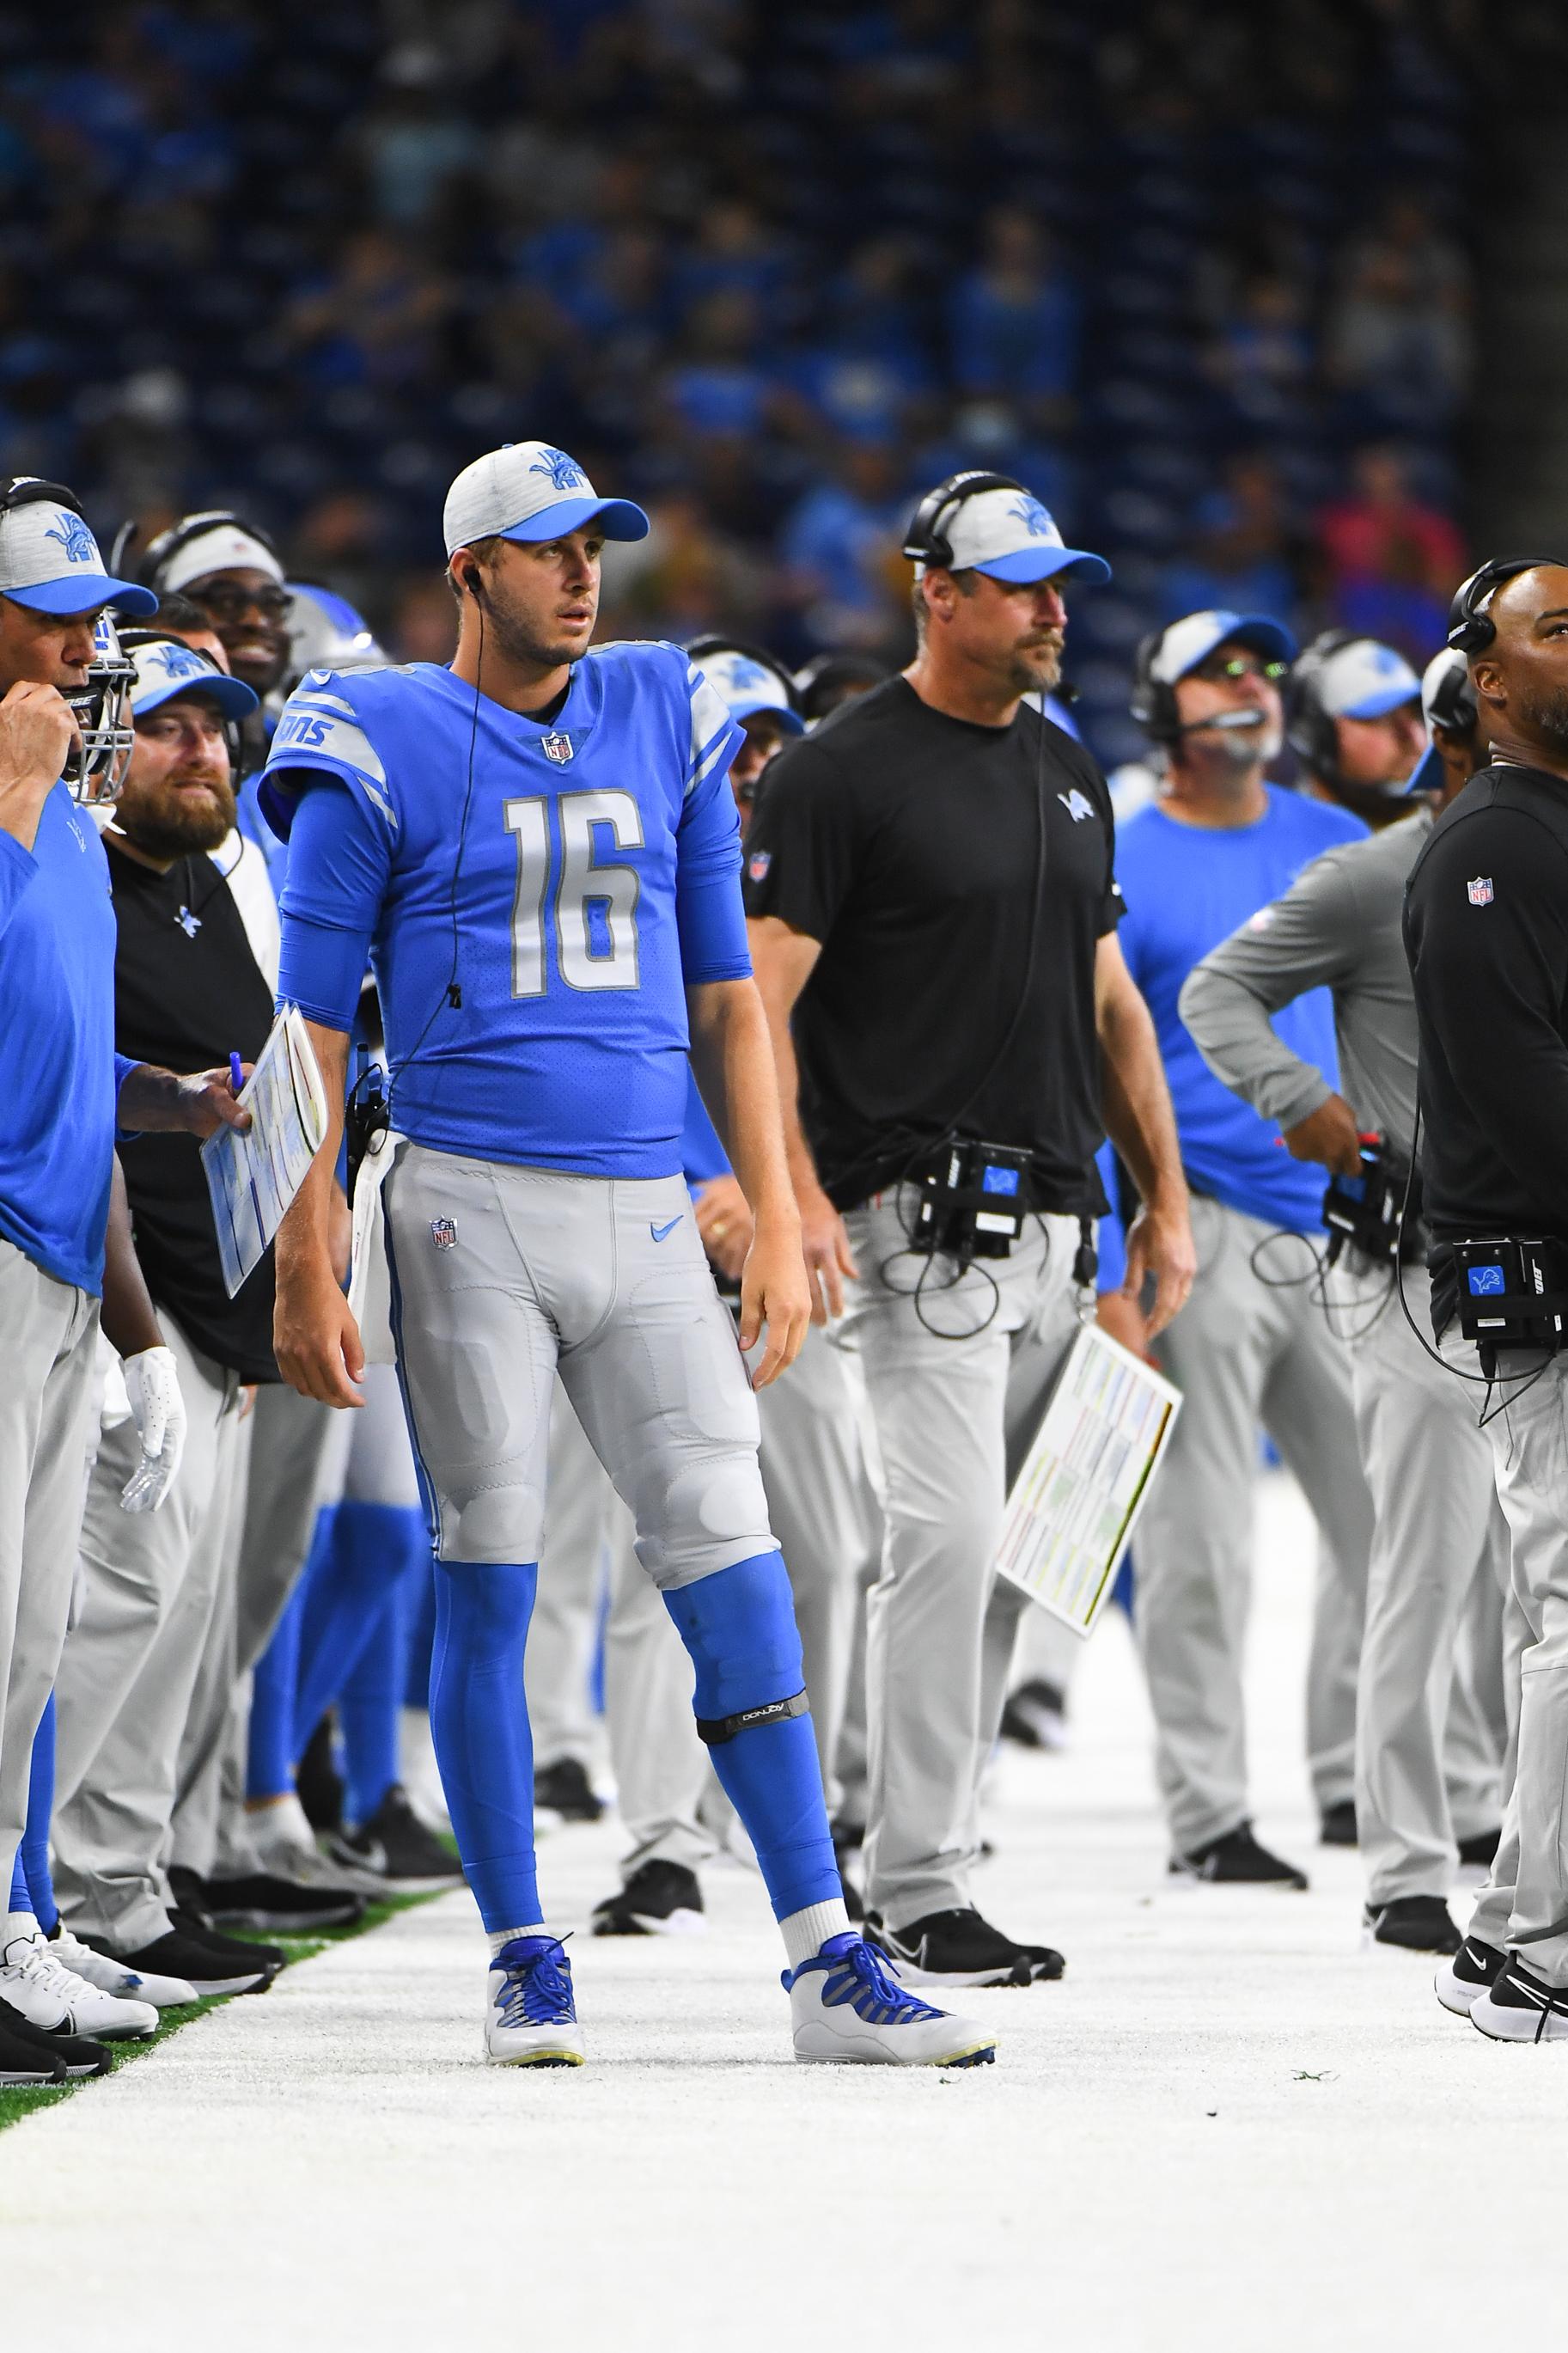 NFL: AUG 27 Preseason - Colts at Lions